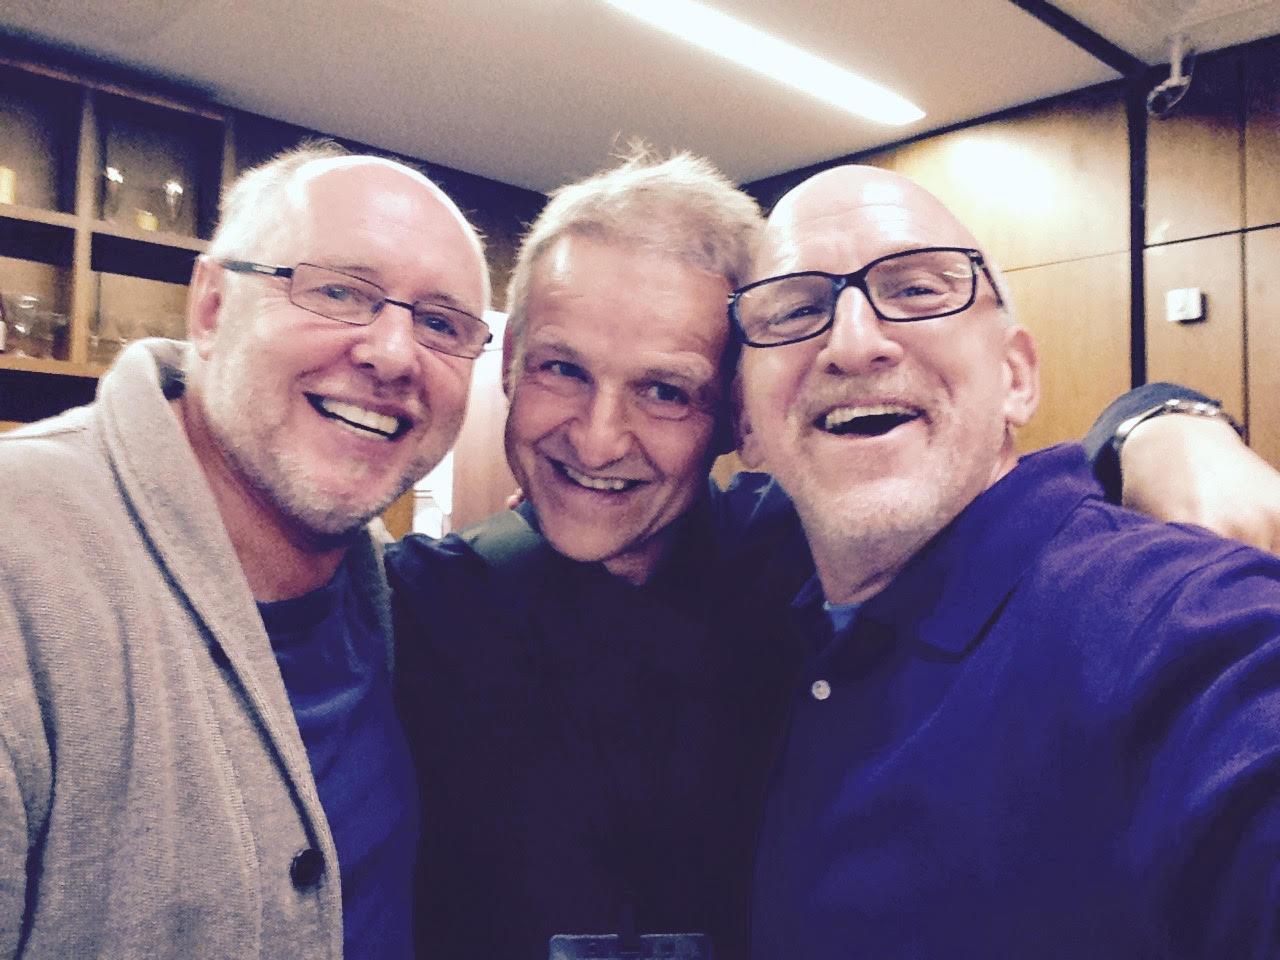 w/ mike Neilsen and Adam Nussbaum at Sligo